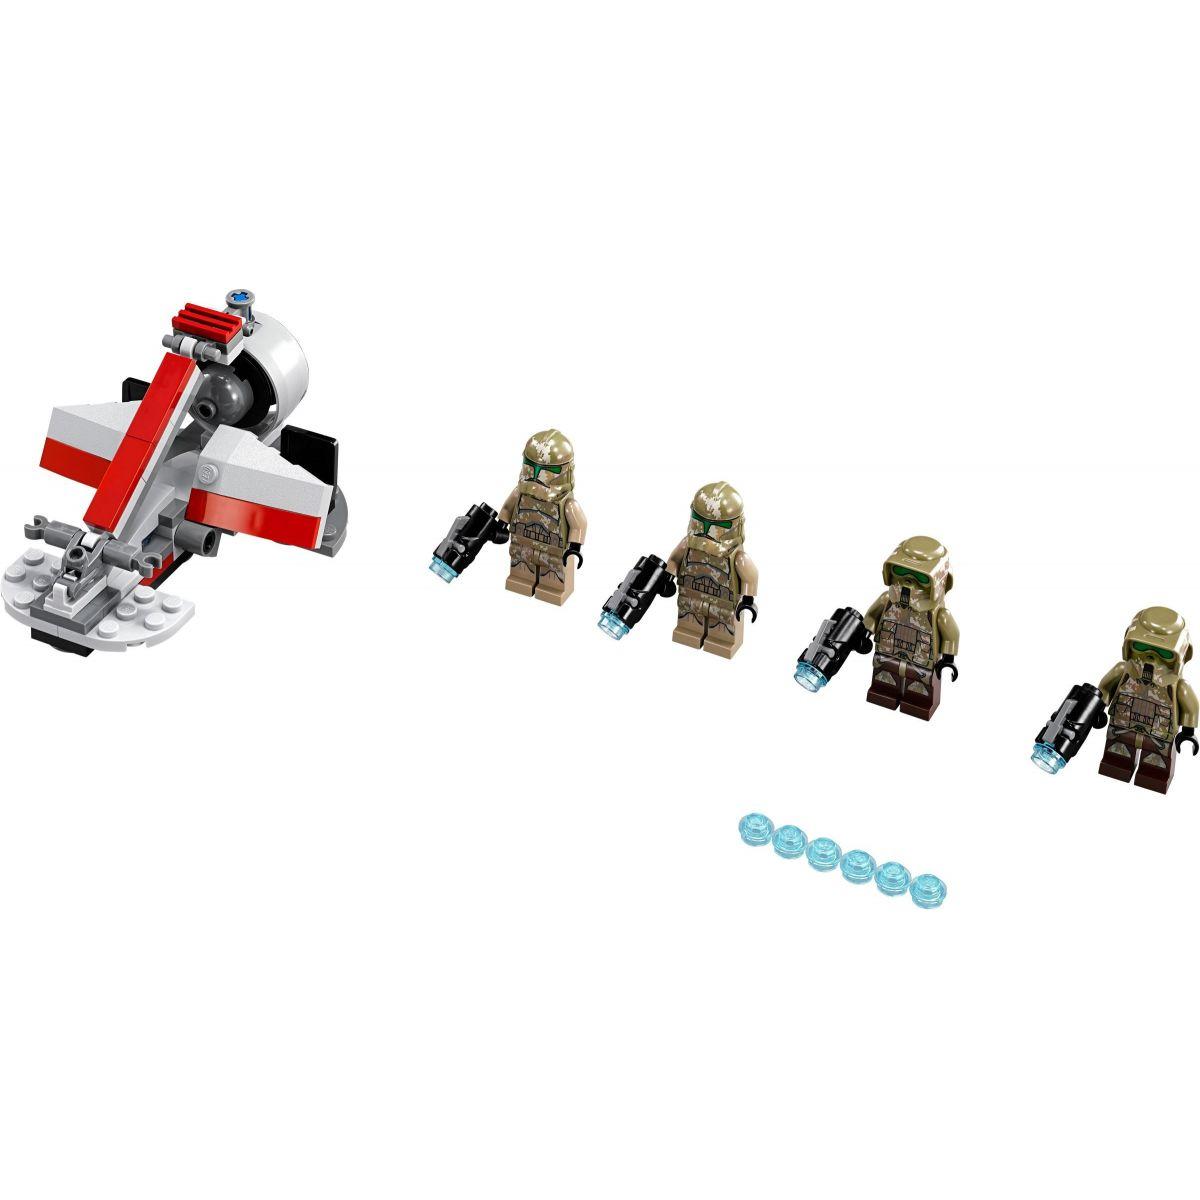 LEGO Star Wars 75035 Kashyyyk Troopers #2